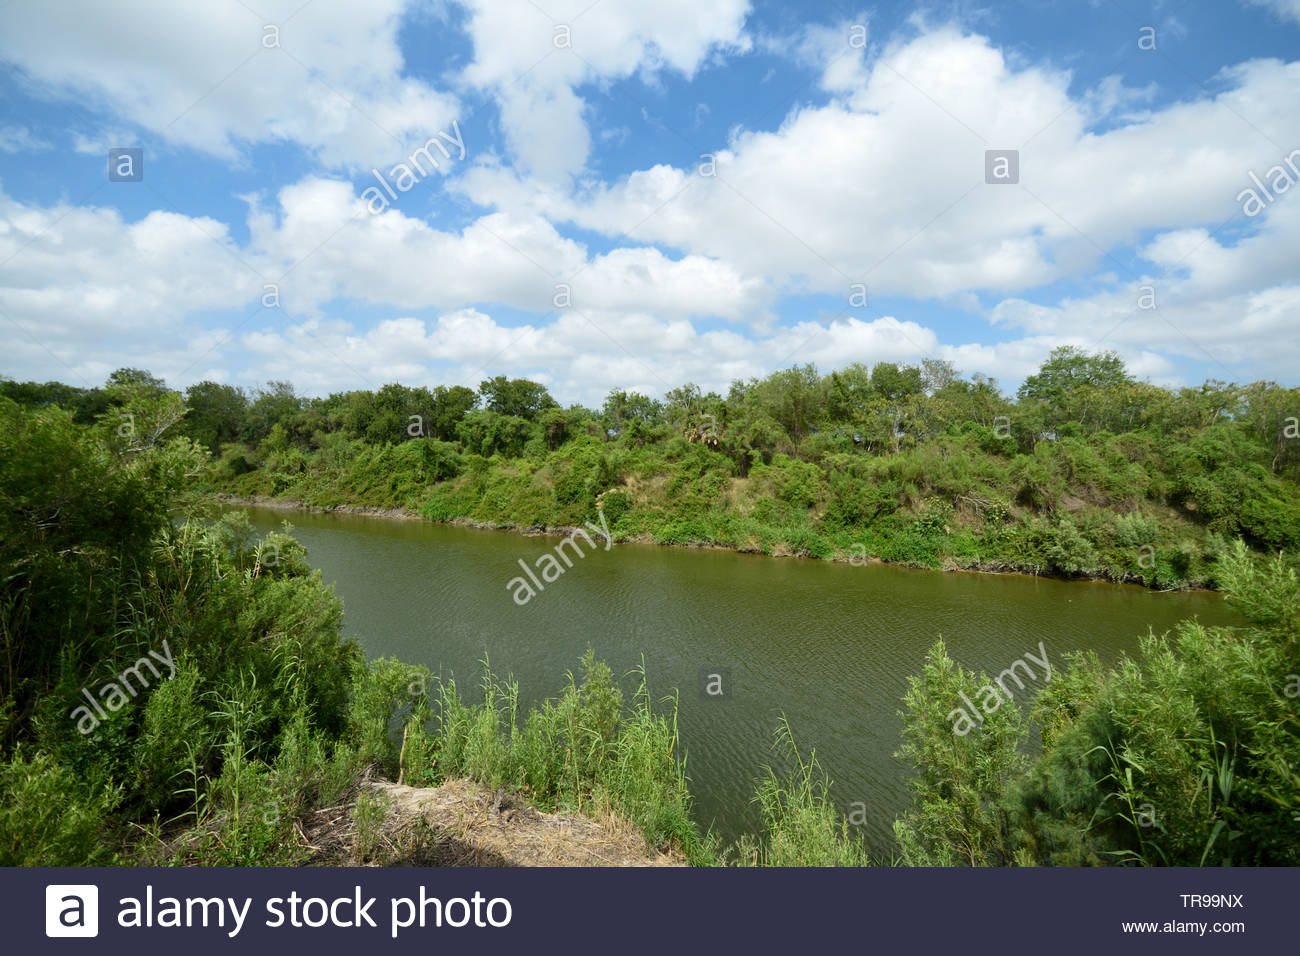 Rio Grande River United States Mexico Border. Rio Grande River. Rio Grande River Brownsville, Texas USA and Tamaulipas Mexico. Sabal Palm Sanctuary US - Stock Image